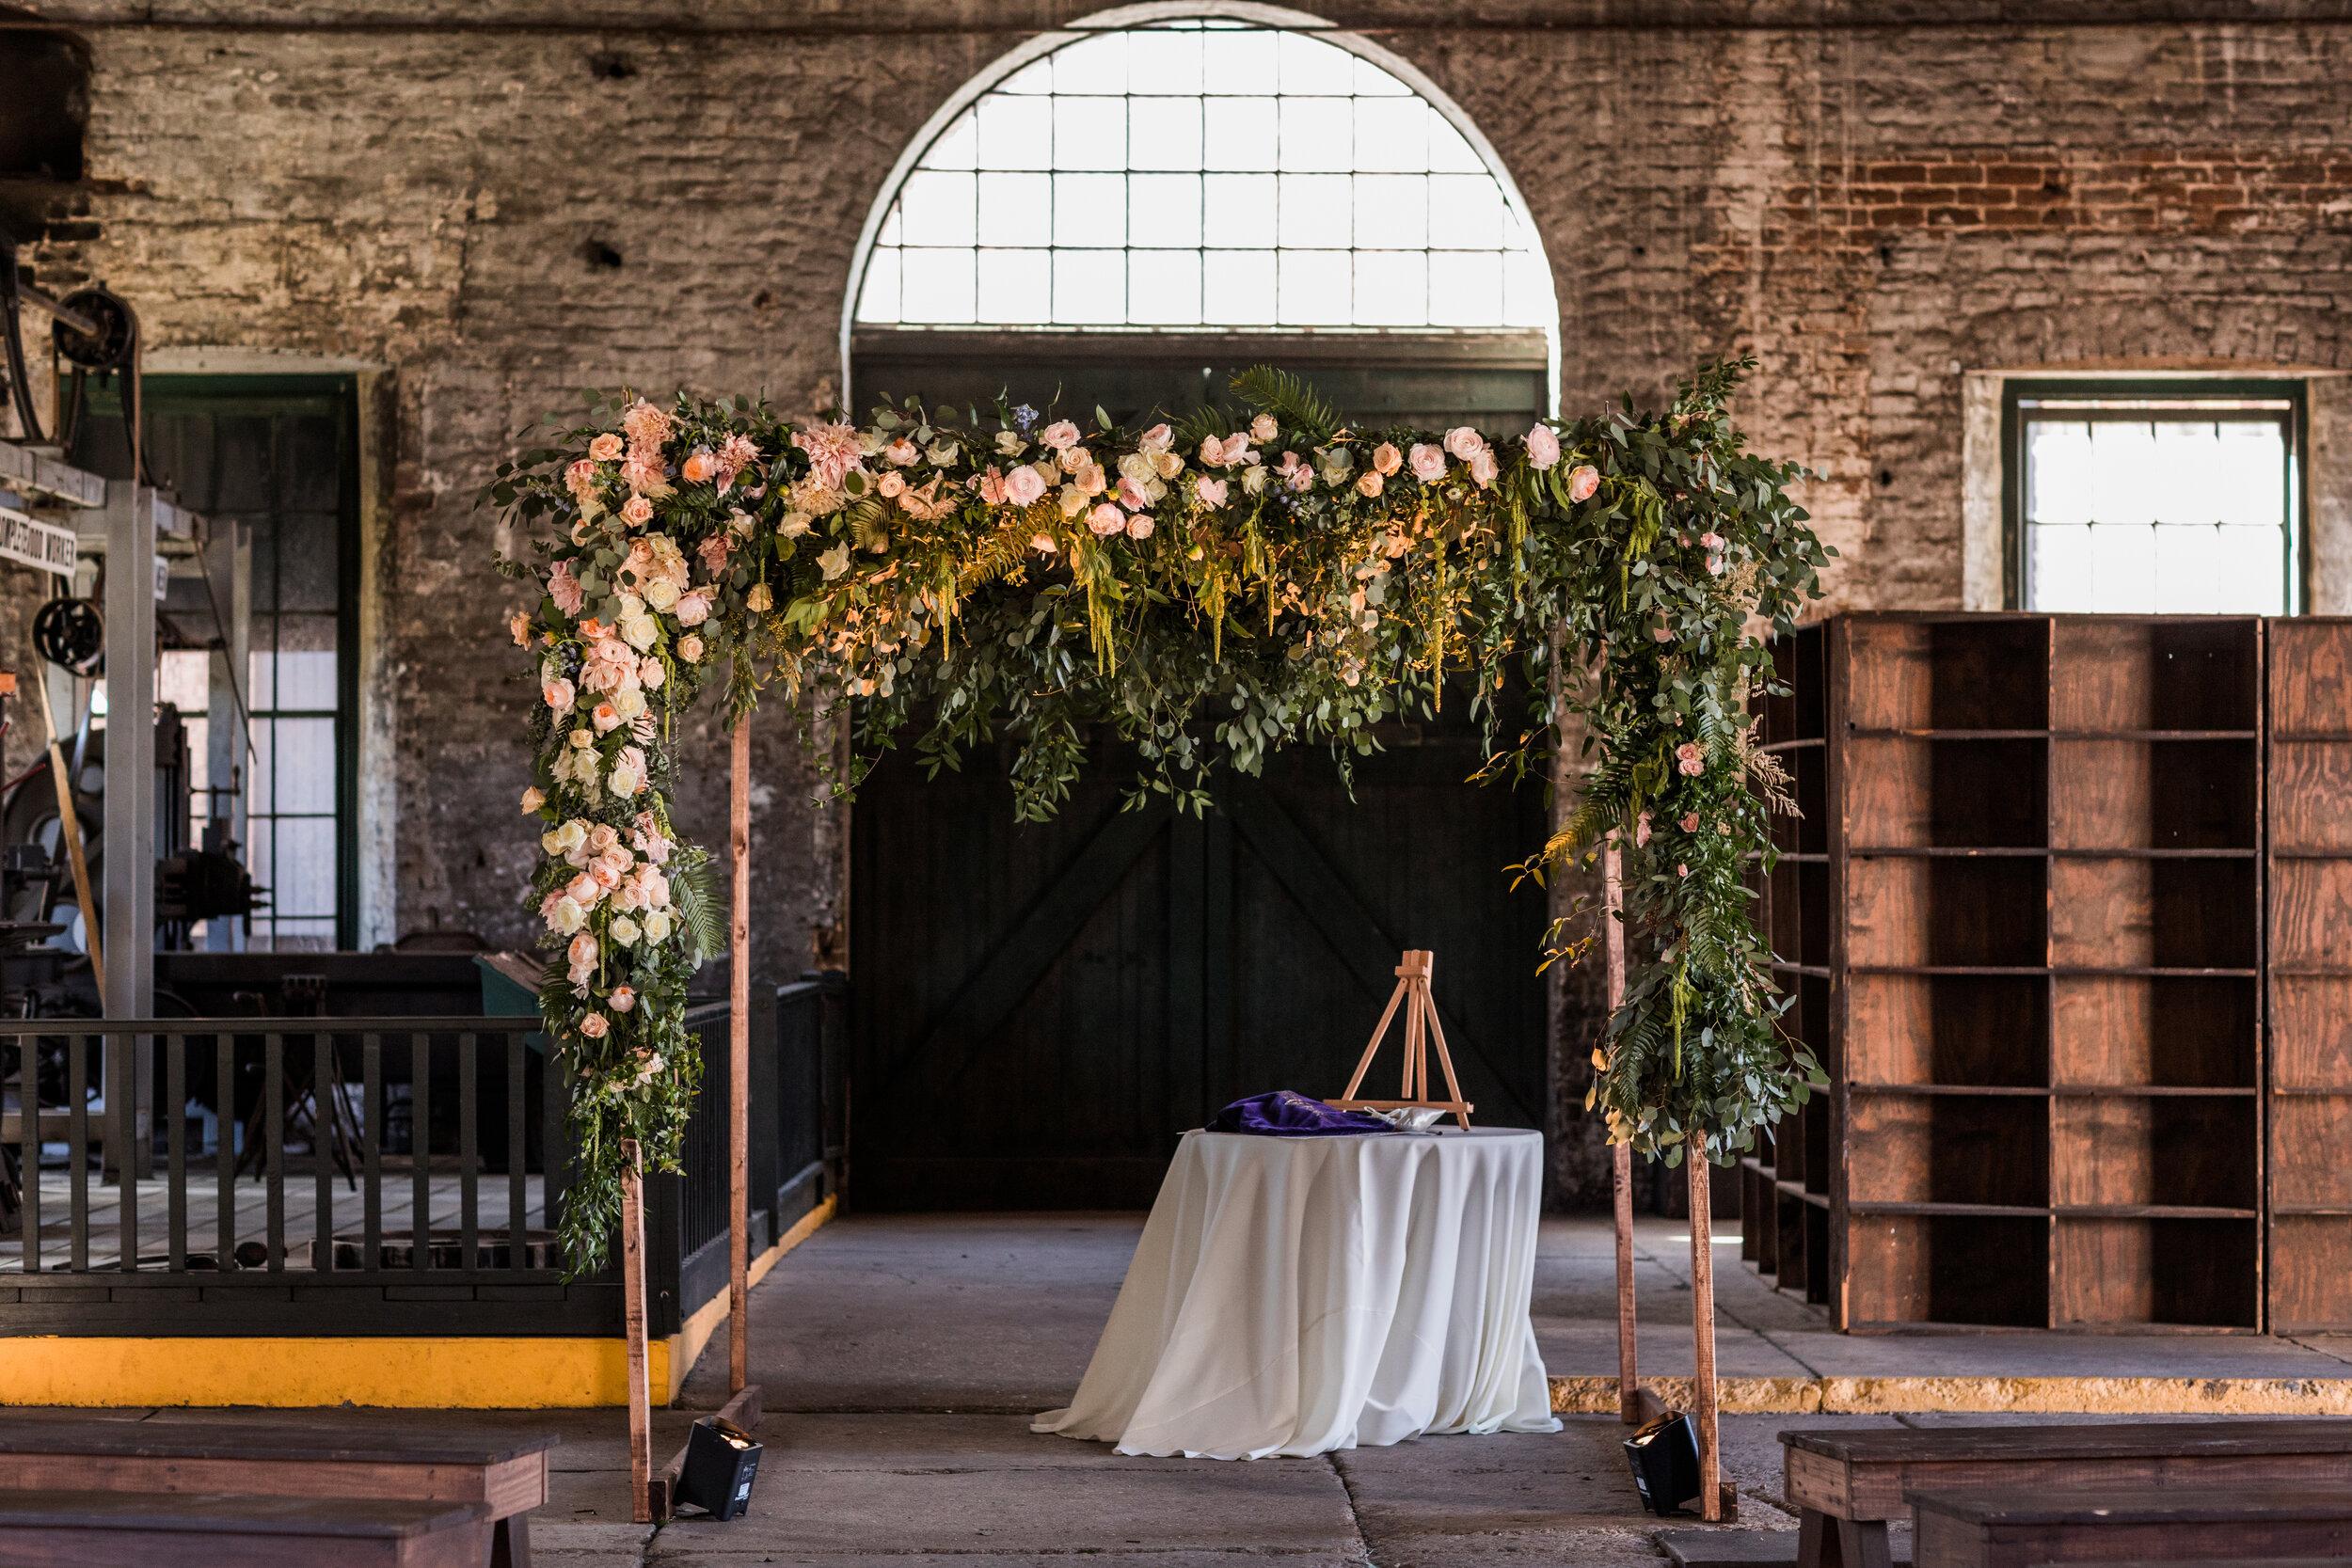 ivory-and-beau-blog-weddings-ivory-and-beau-couple-dominique-and-andres-savannah-florist-wedding-planning-savannah-bridal-boutique-wedding-flowers-KIP_WEBERWEDDING_RAILROADMUSEUM-756.JPG